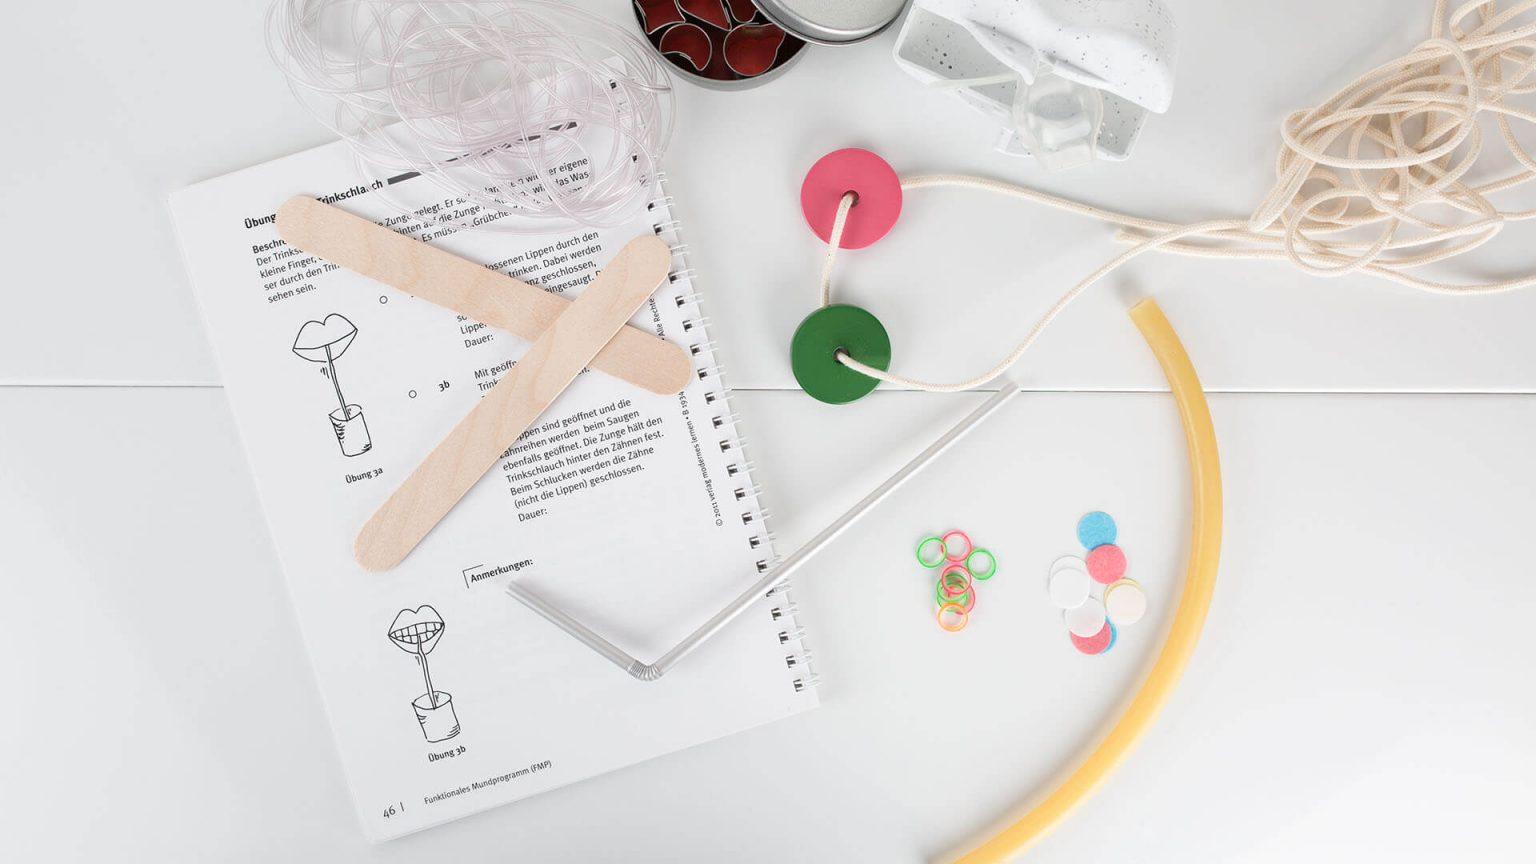 pa-logo-tools-web-hd